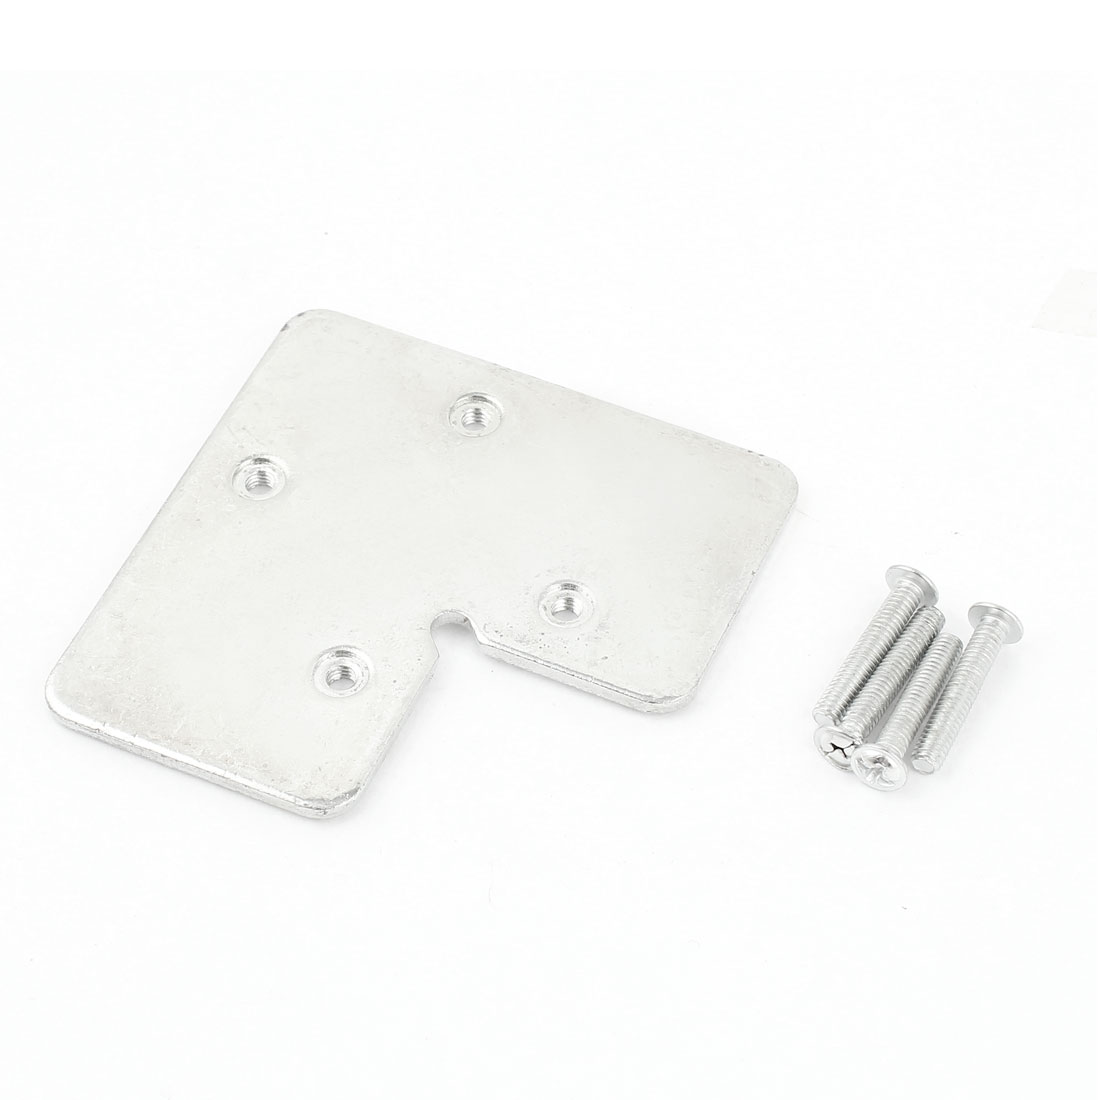 Angle Plate Corner Brace Flat L Shape Repair Bracket Silver Tone 70mm x 70mm